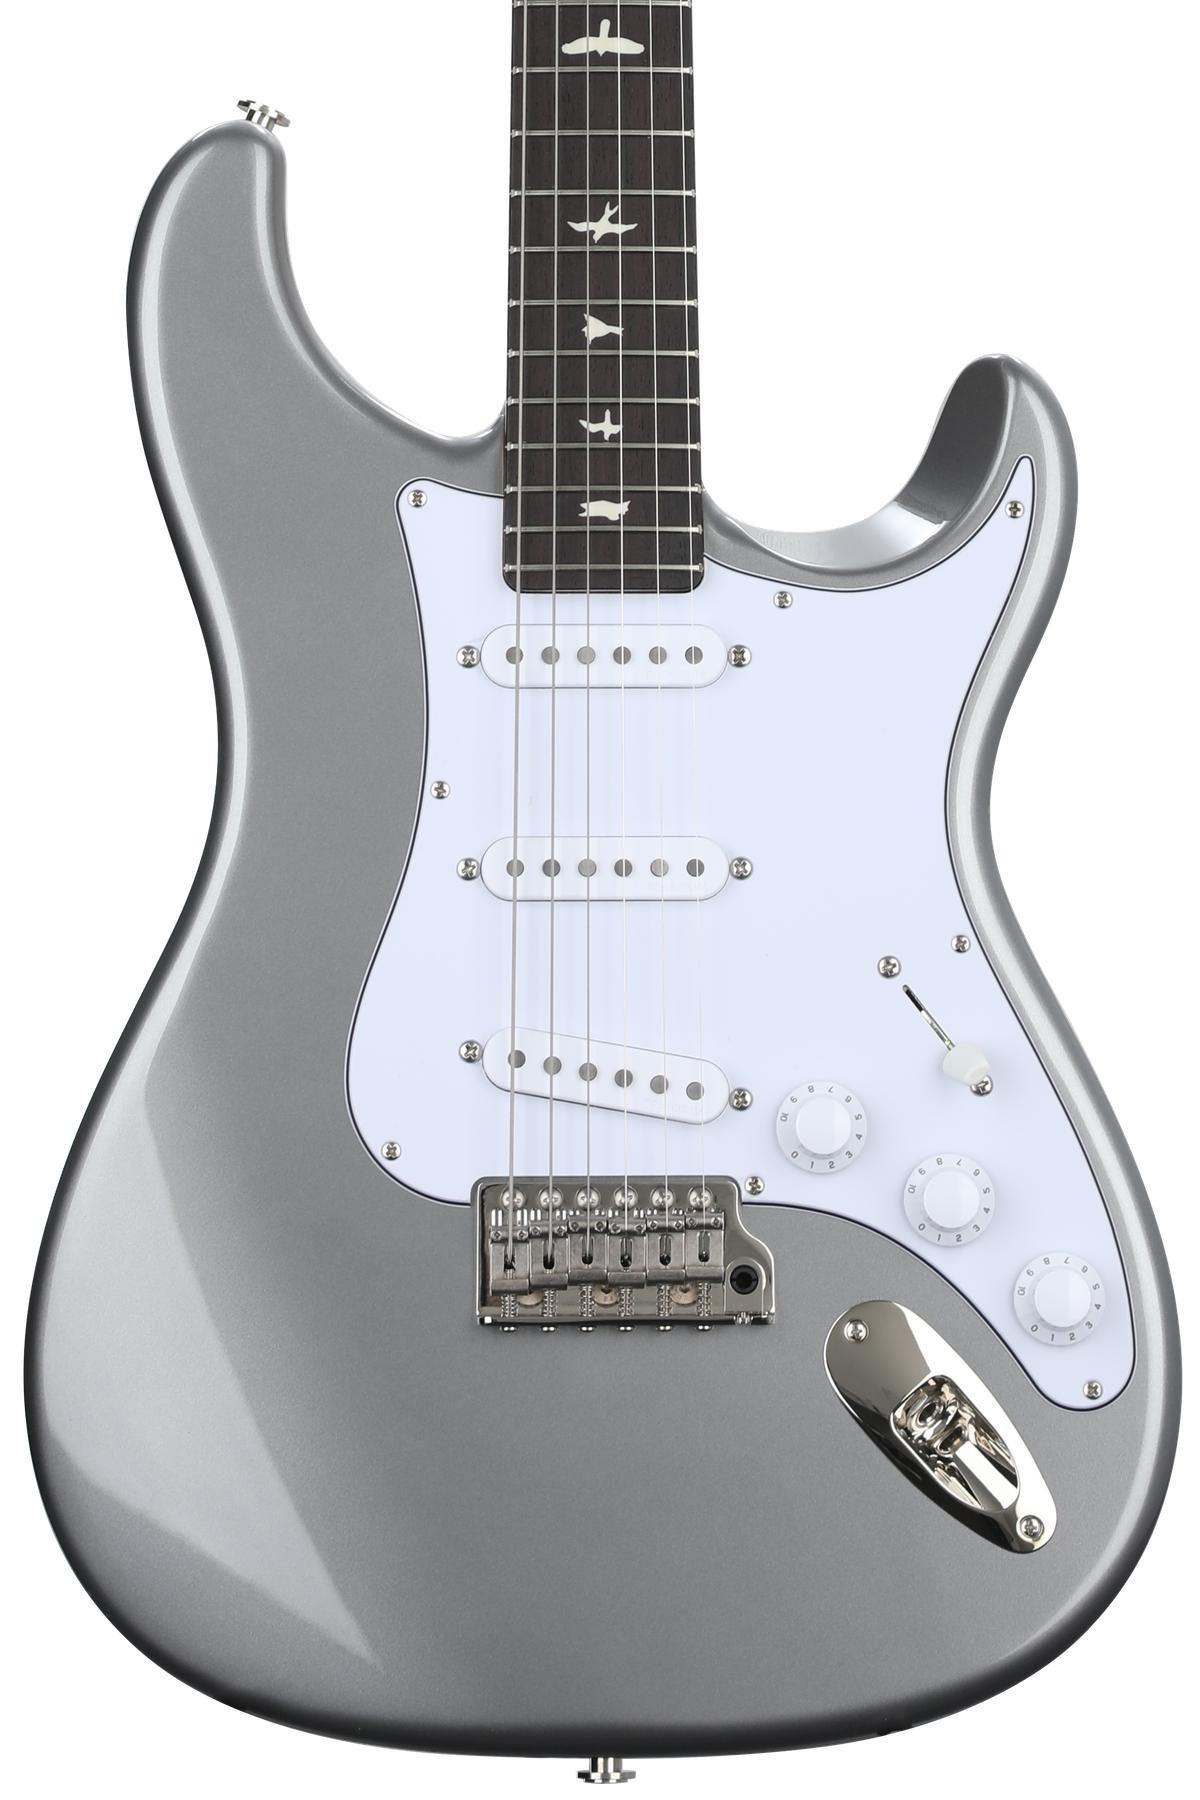 Prs John Mayer Silver Sky Tungsten Sweetwater Guitar Image 1